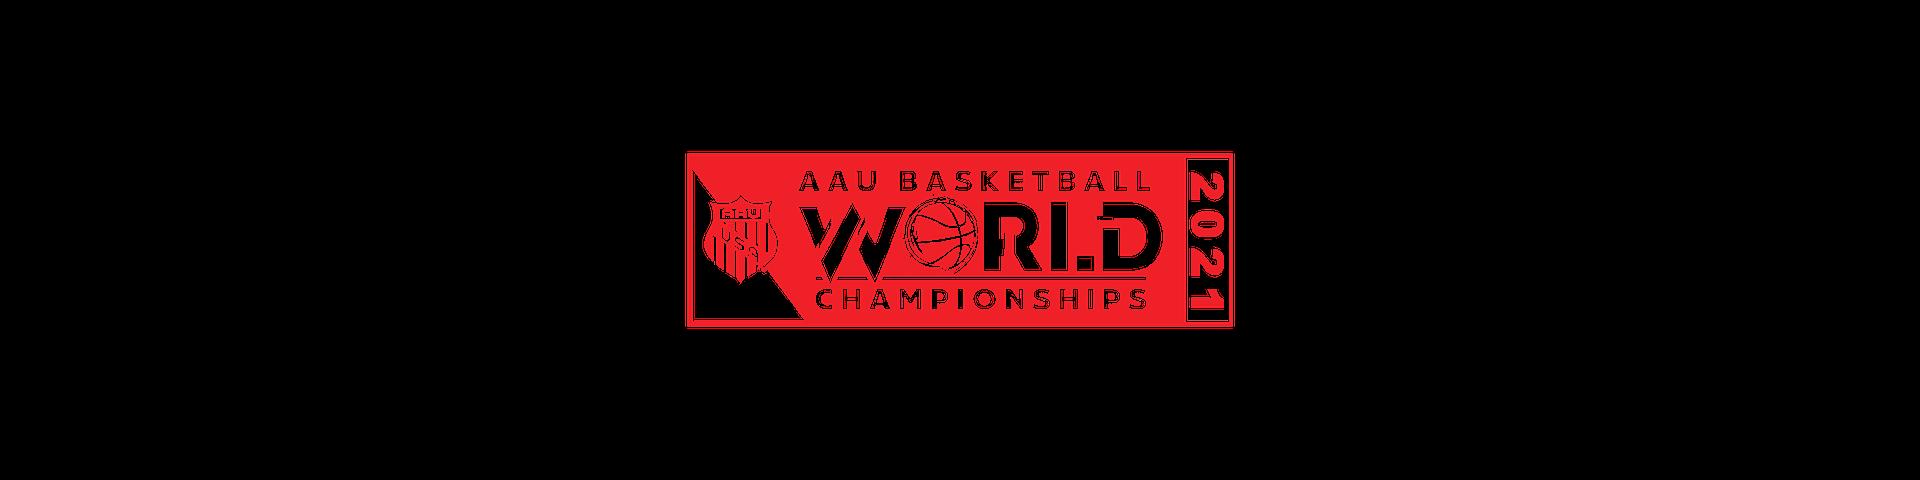 AAU World Championships 2021